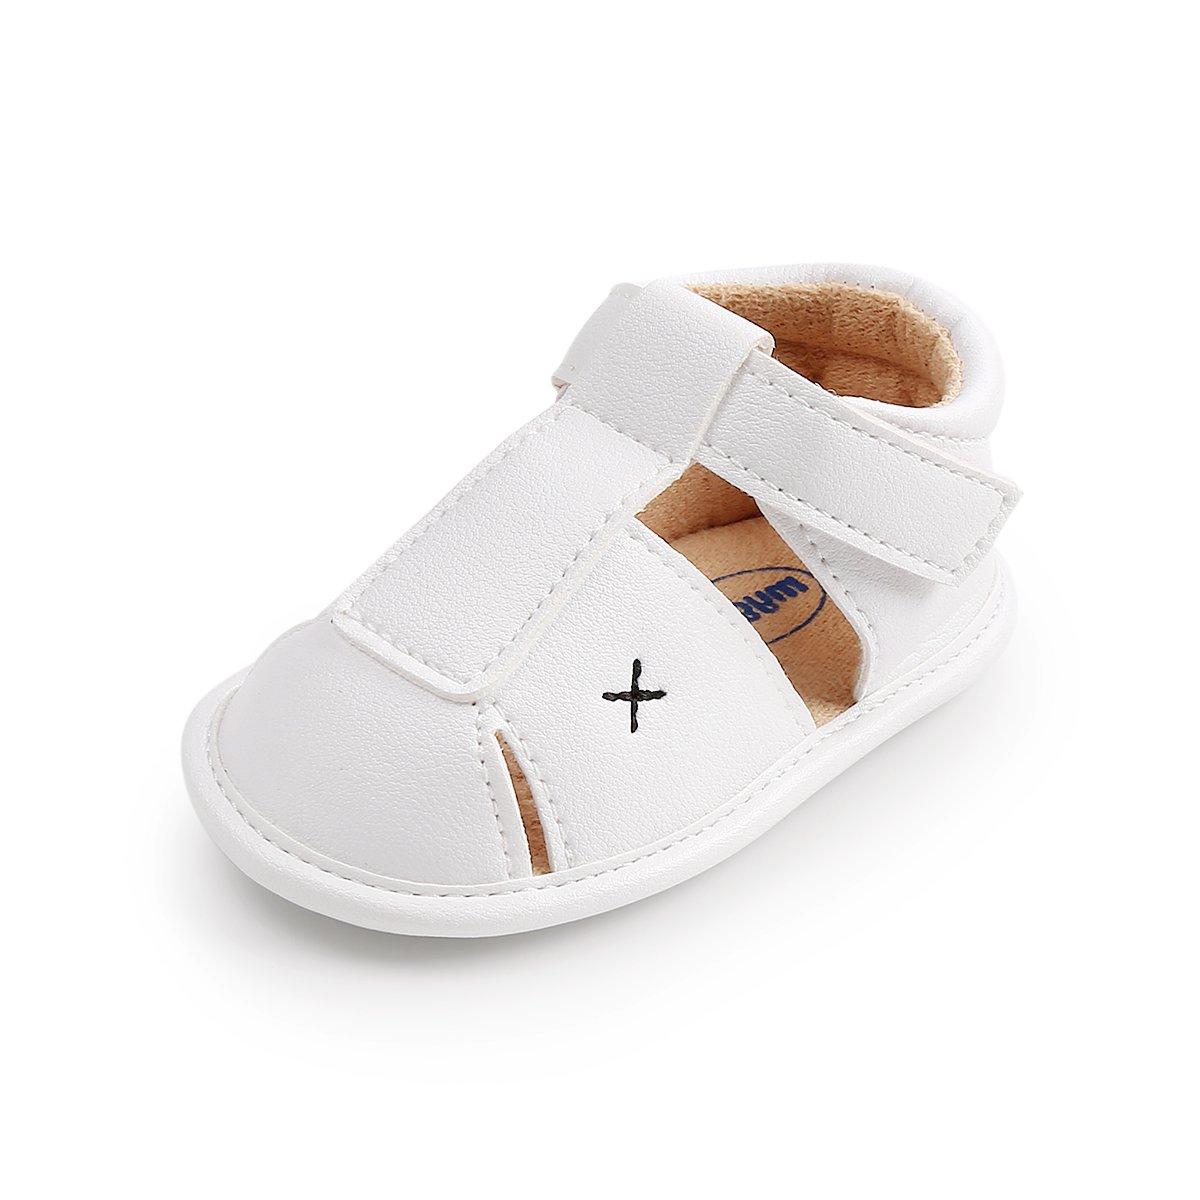 LUWU Baby Boy Girls Anti-Slip Sole Sandals Crib Shoes (6-12 Months, White) by LUWU